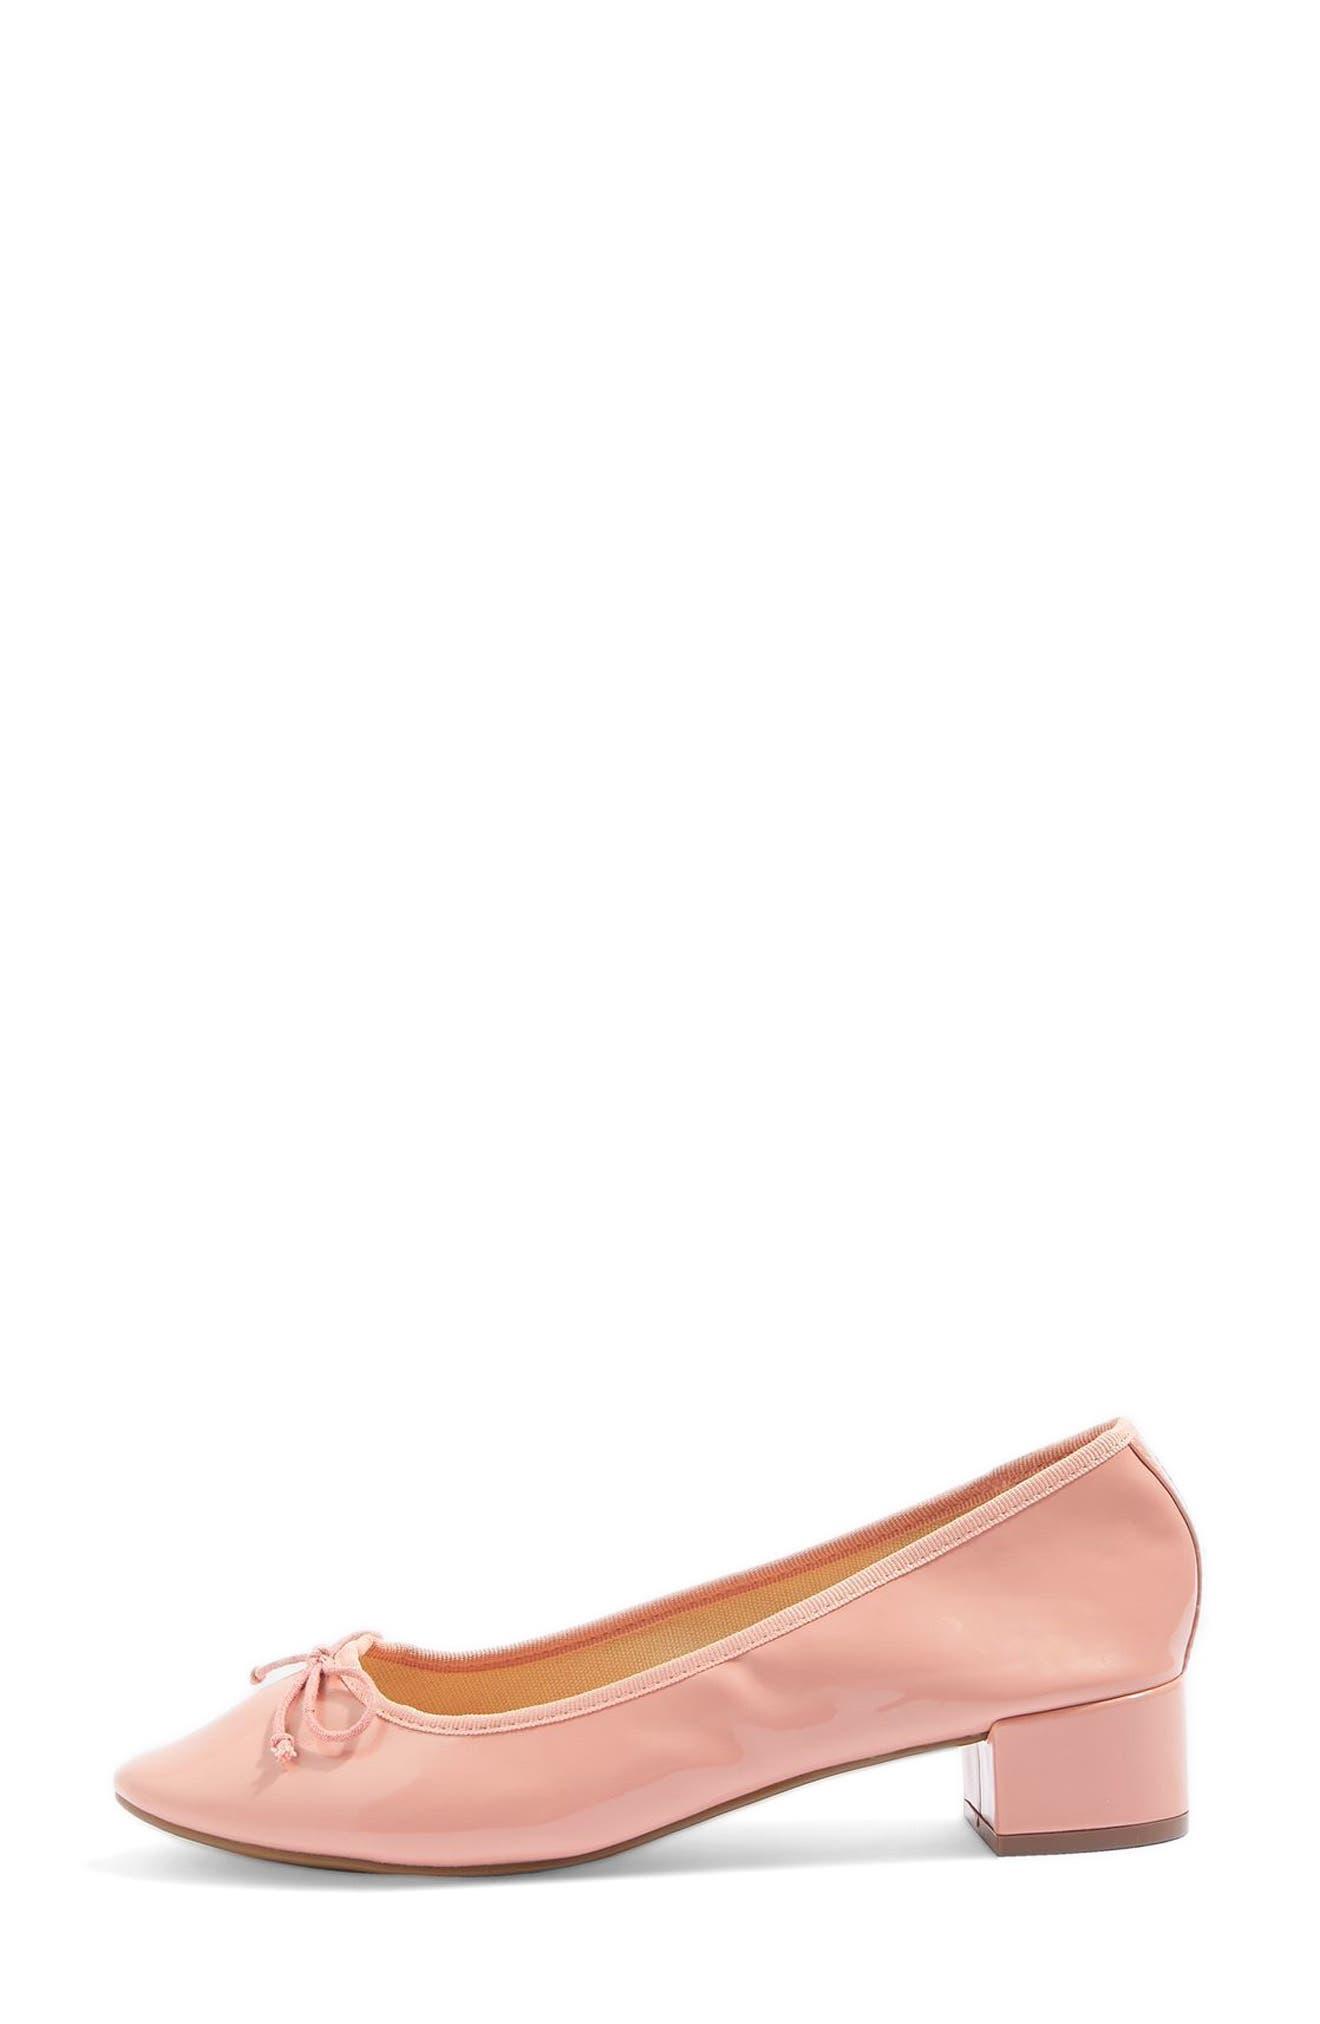 Glory Heeled Ballerina Slippers,                             Alternate thumbnail 2, color,                             650